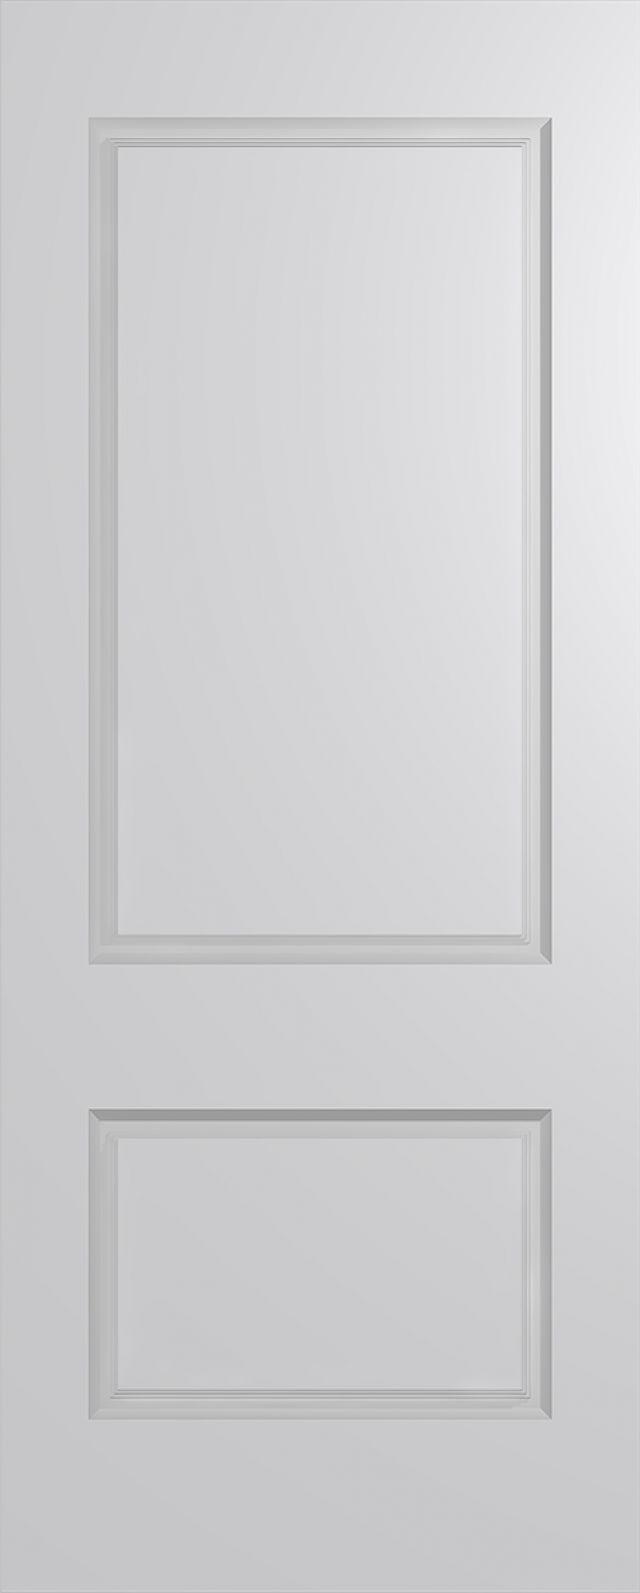 HMC2. Humecraft. Customise your door  sc 1 st  Hume Doors & HMC2 | Humecraft | Hume Doors